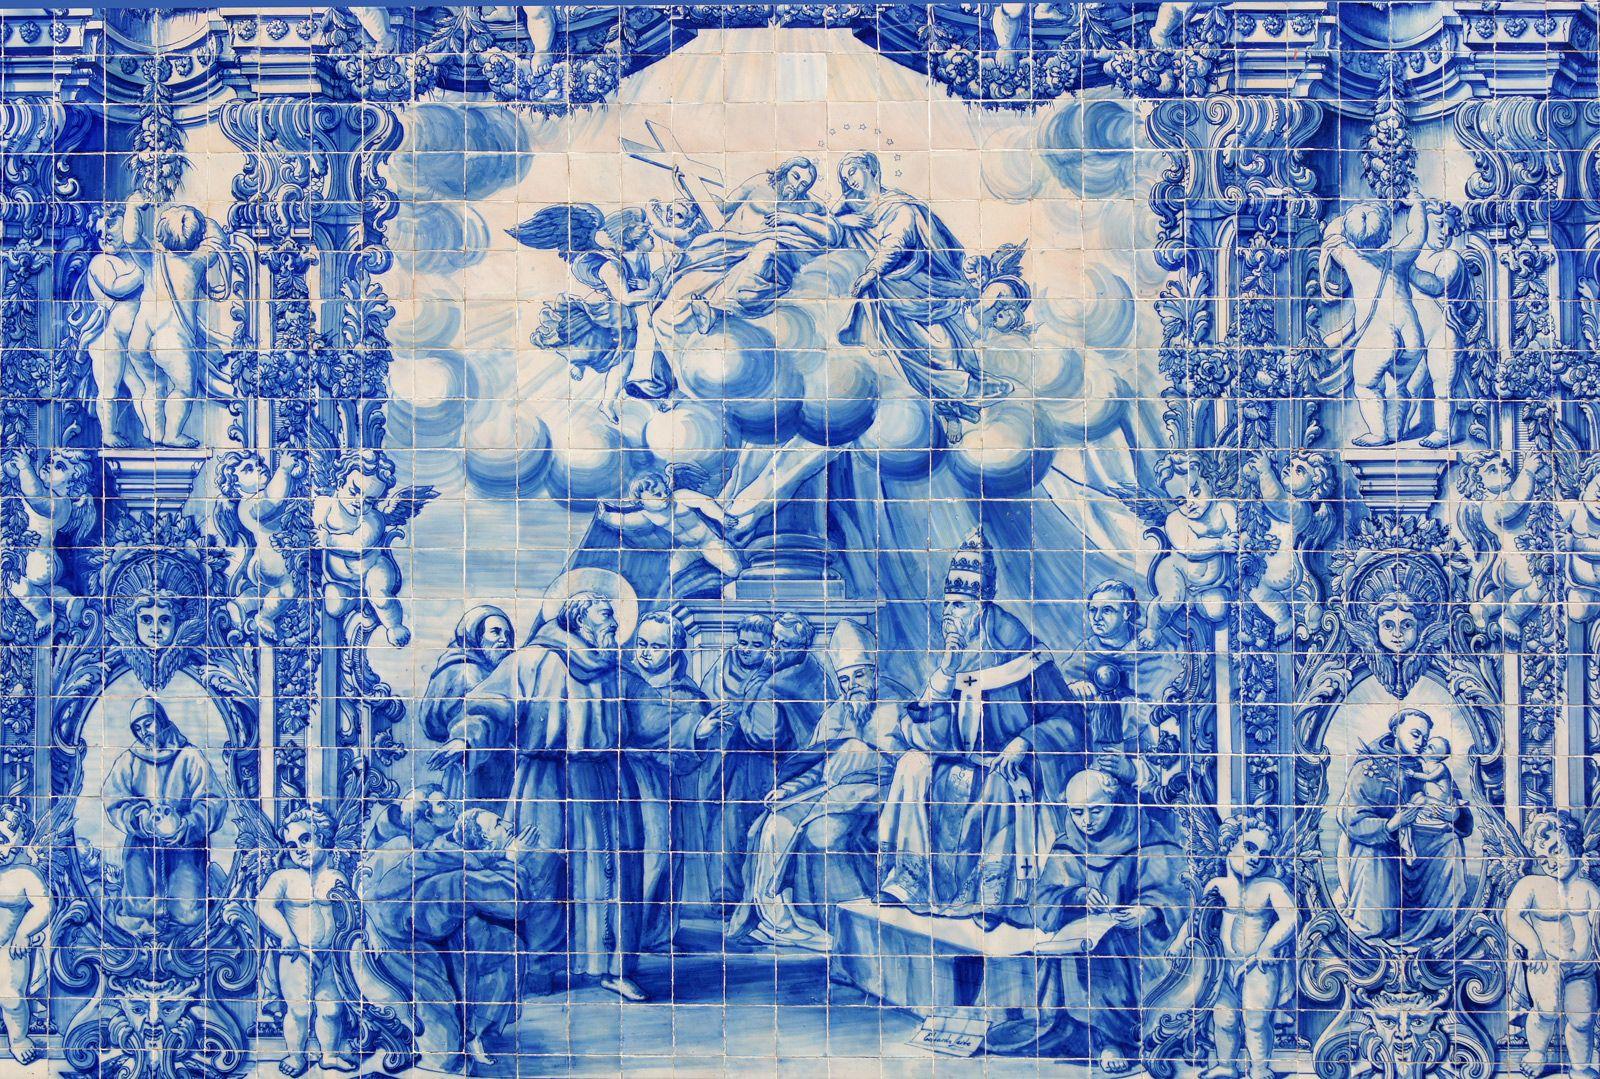 azulejos - Cerca con Google